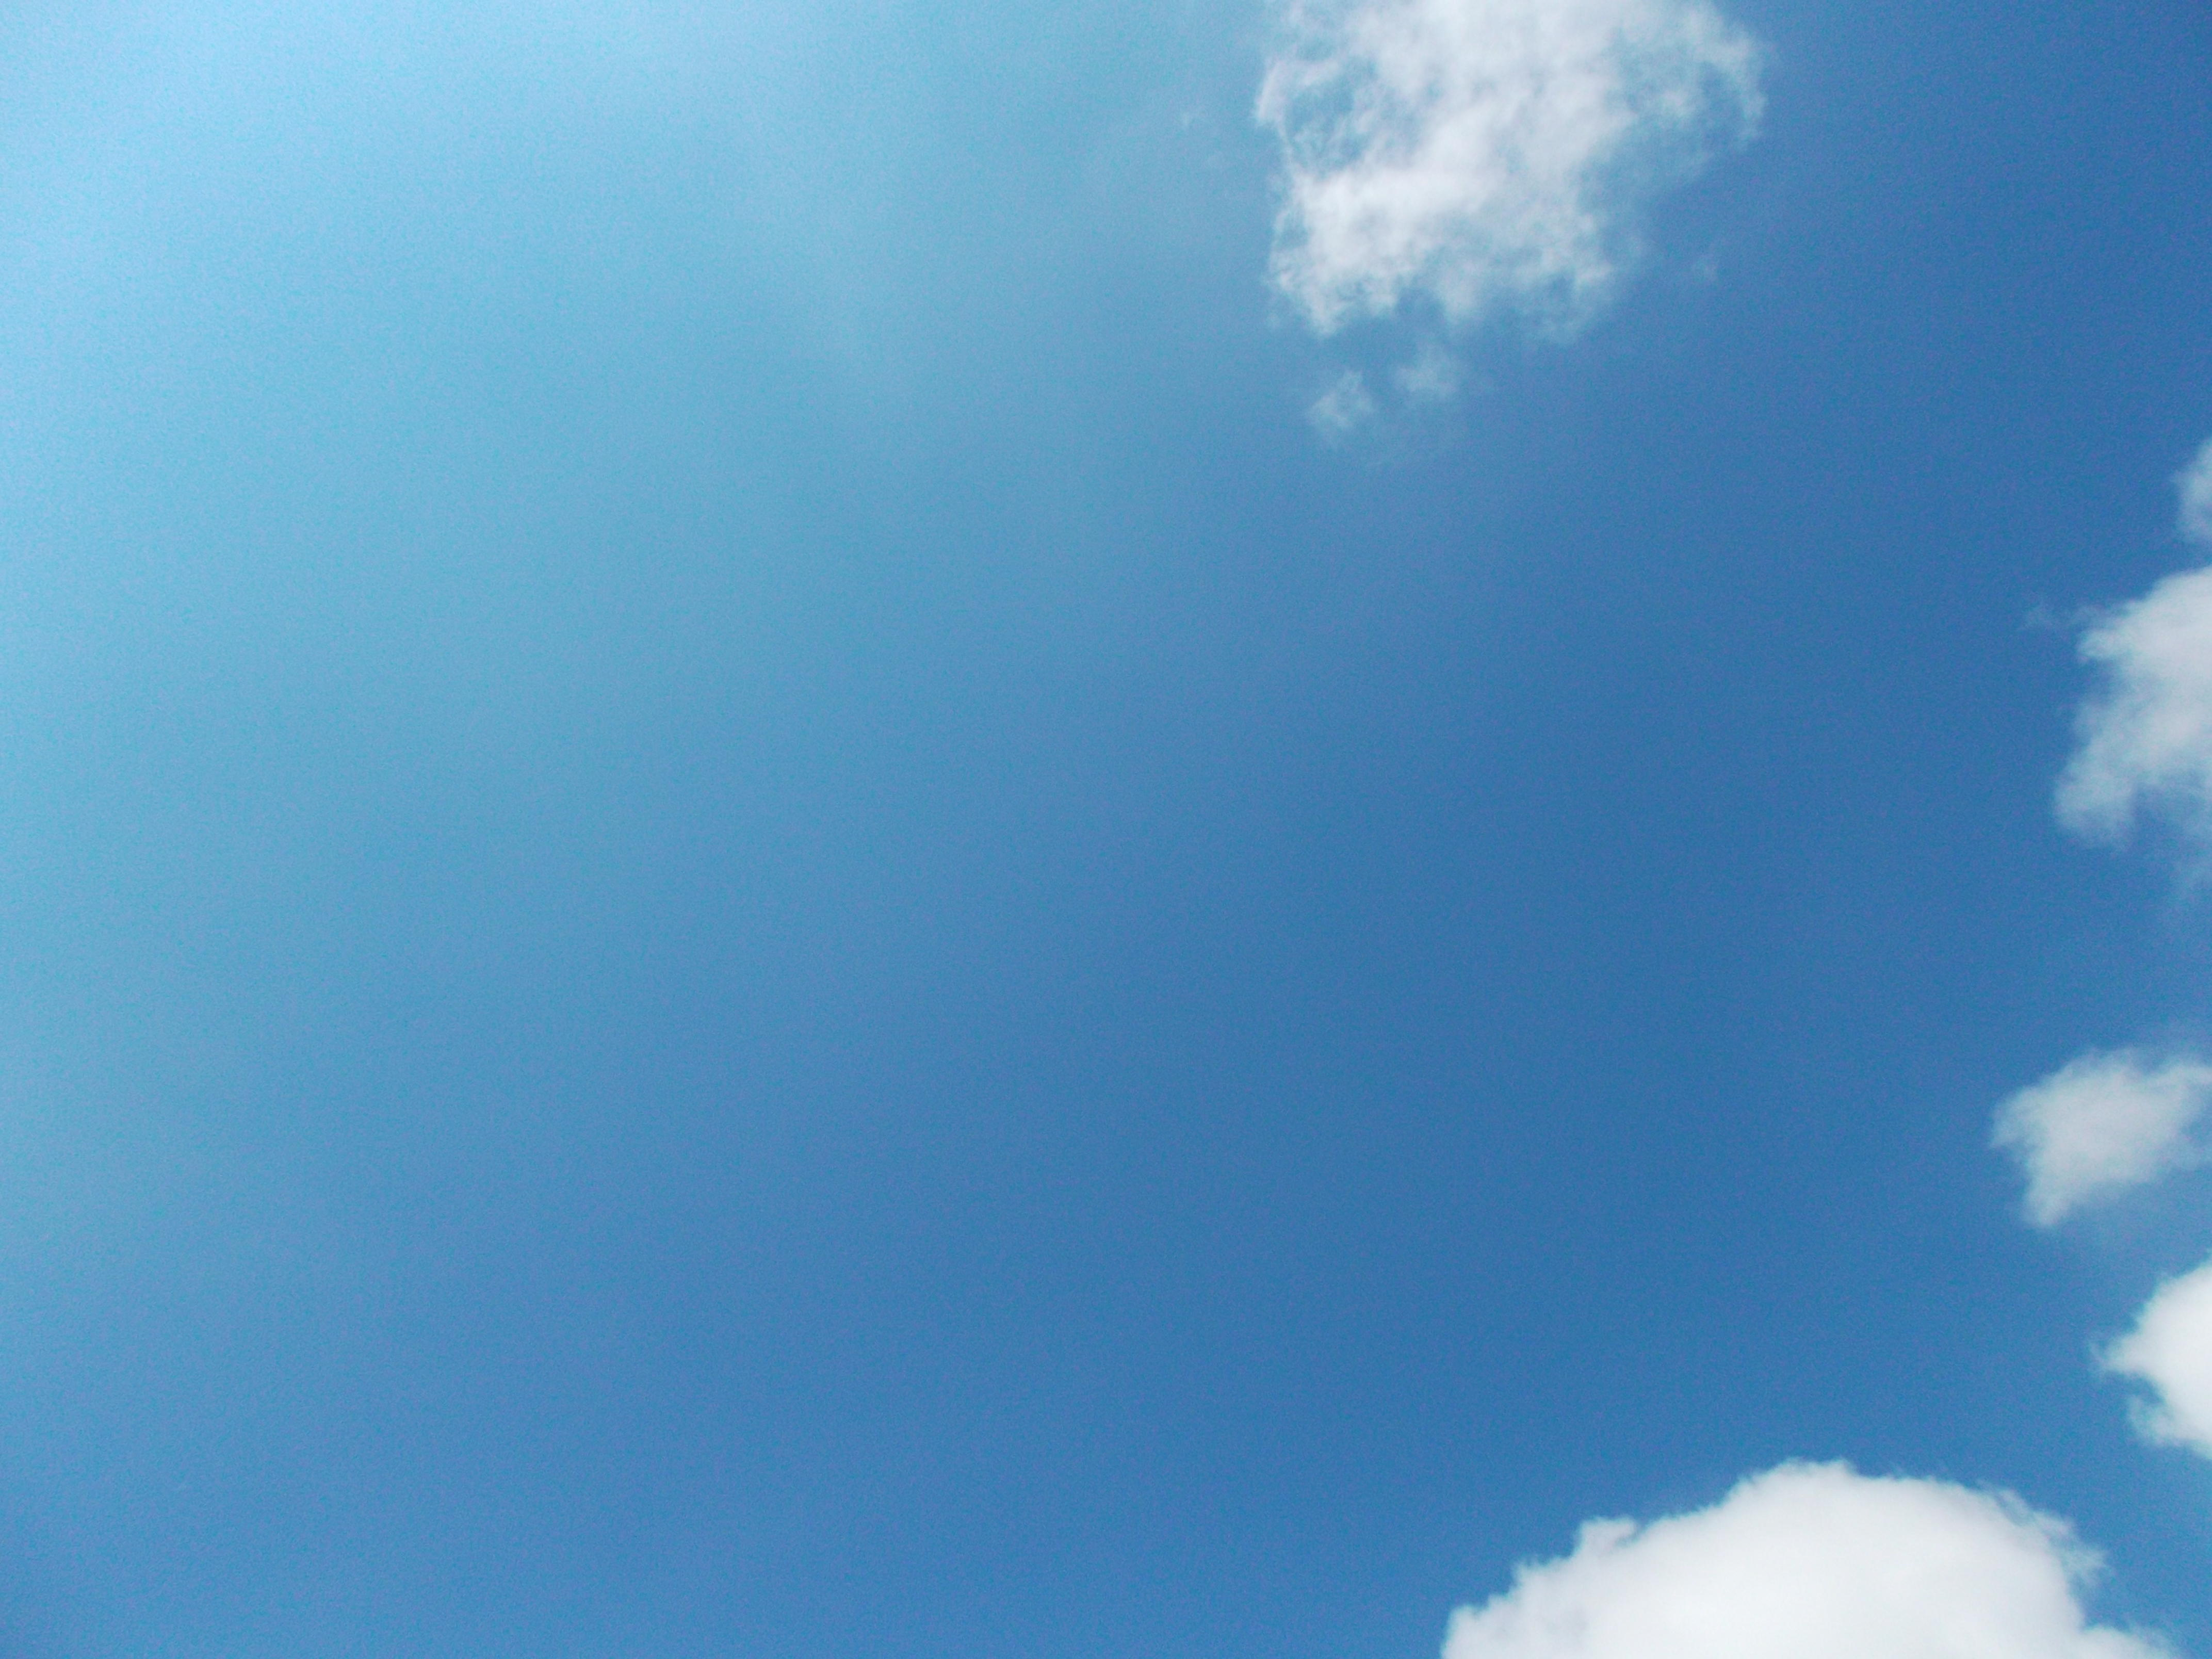 2013-06-03 Longitude -0.371 Latitude 49.182 Altitude 29 Heure 11h23